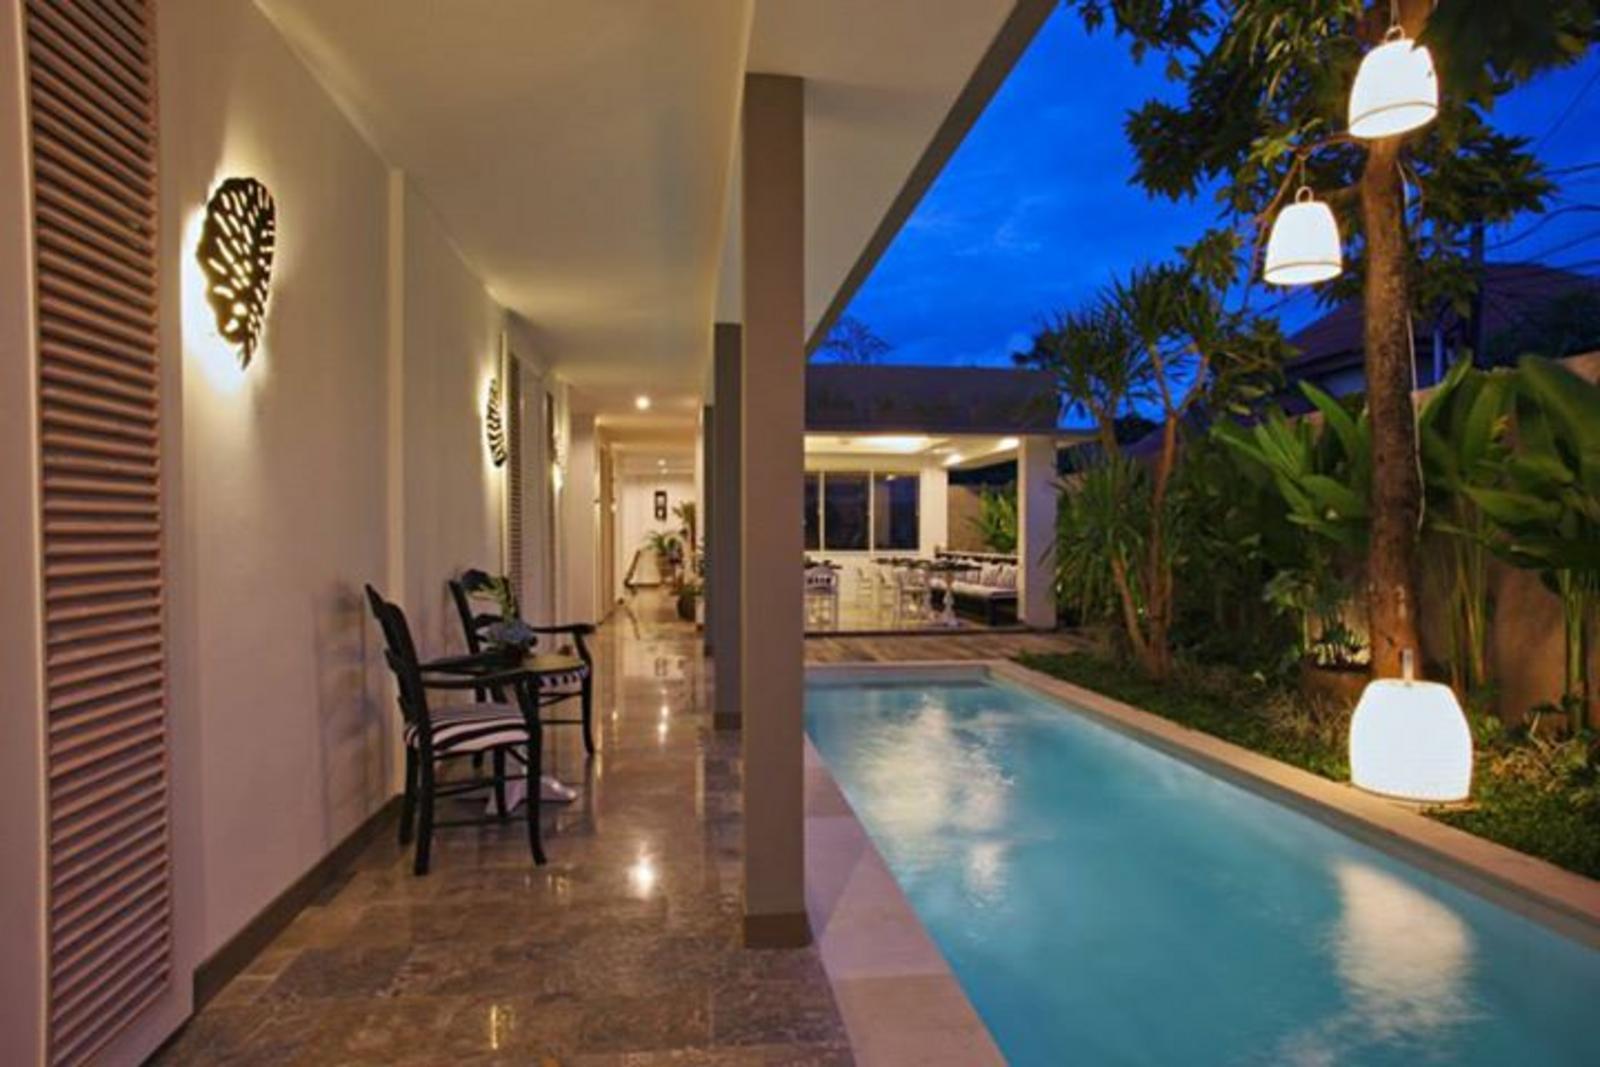 Hotel Summerhome Umasari seminyak bali mini pool 2